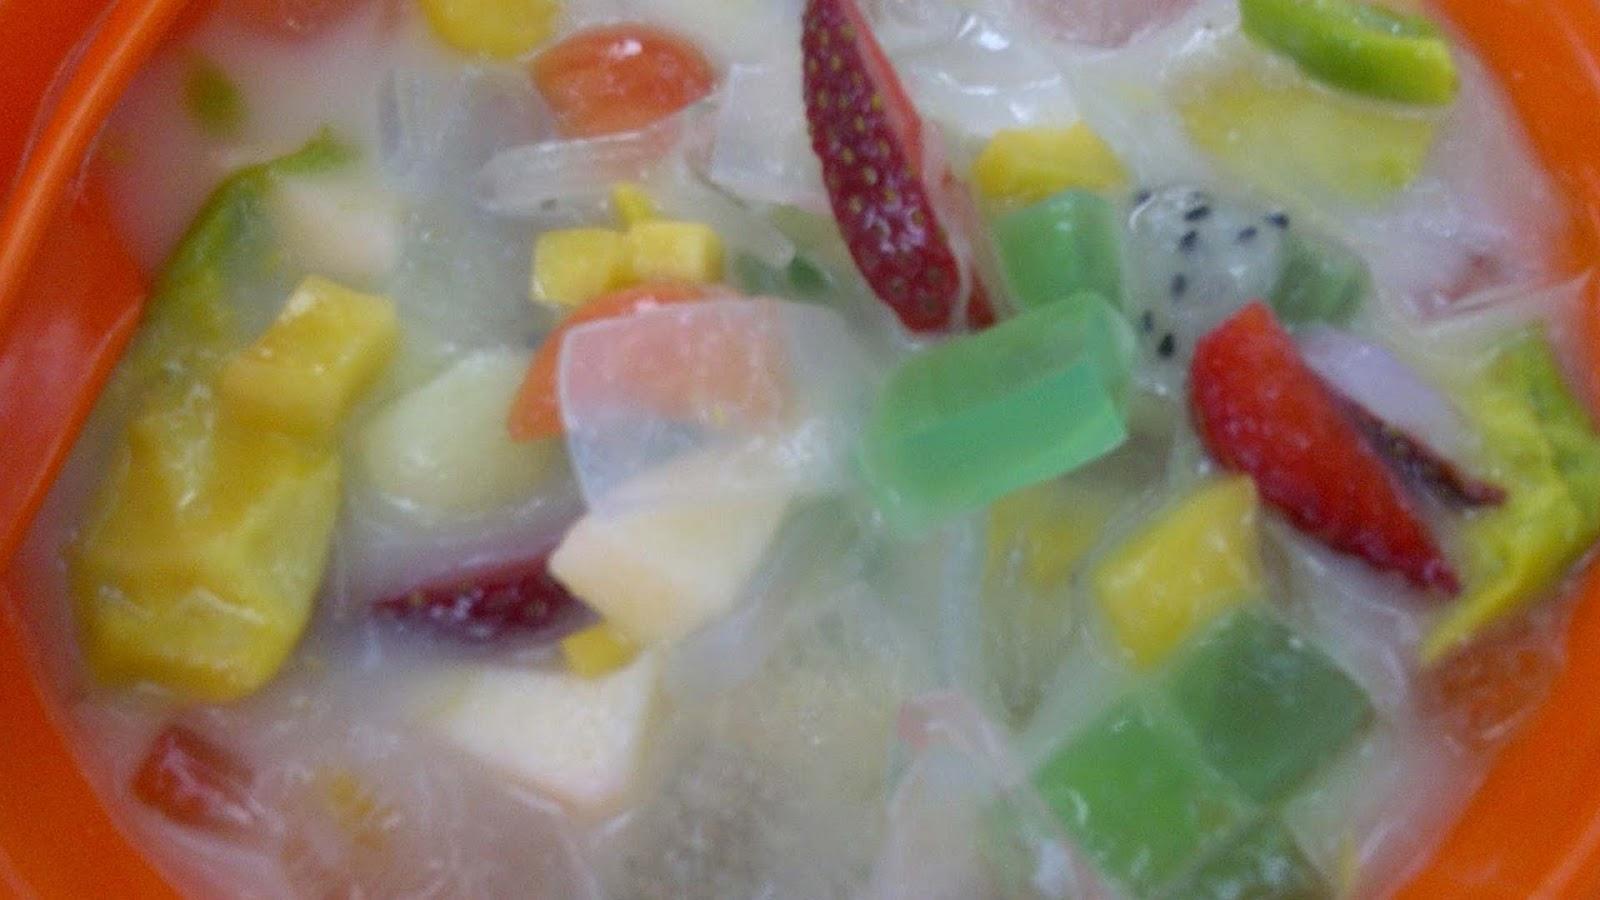 gambar sop buah segar www.buahaz.com